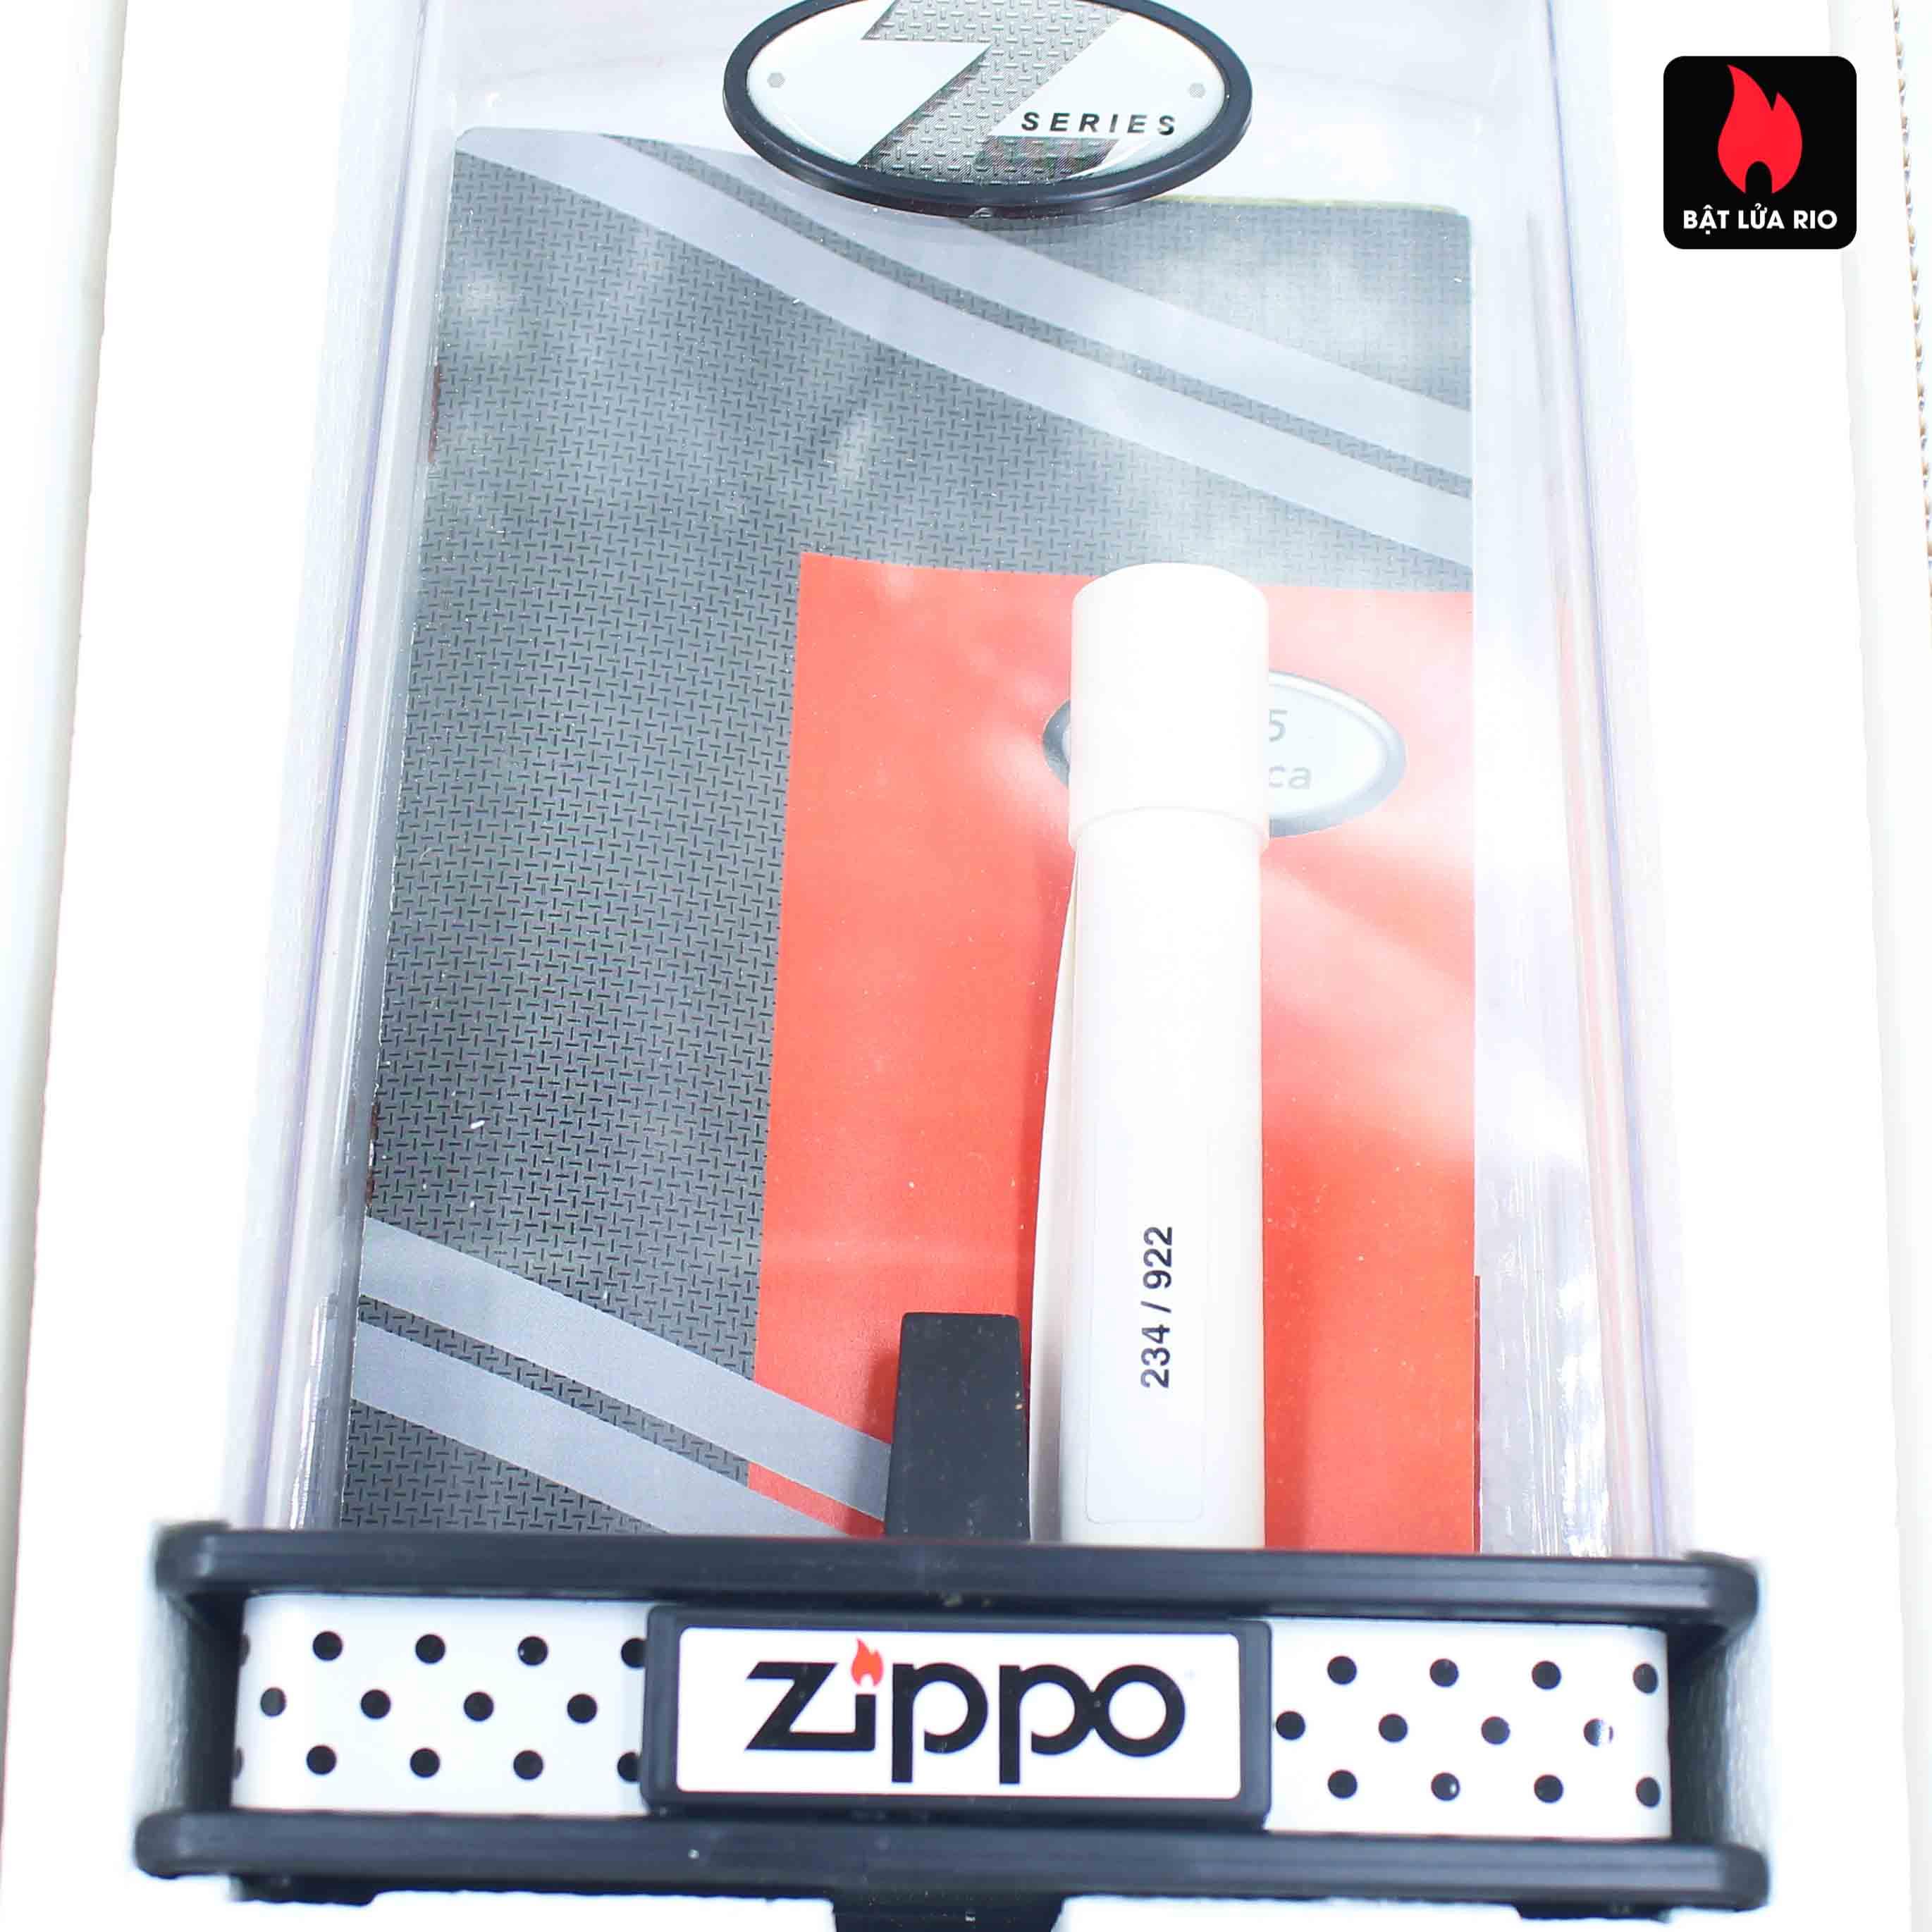 Zippo 2007 - Z-Series Replica 1935 - Zippo Click Collectibles 4